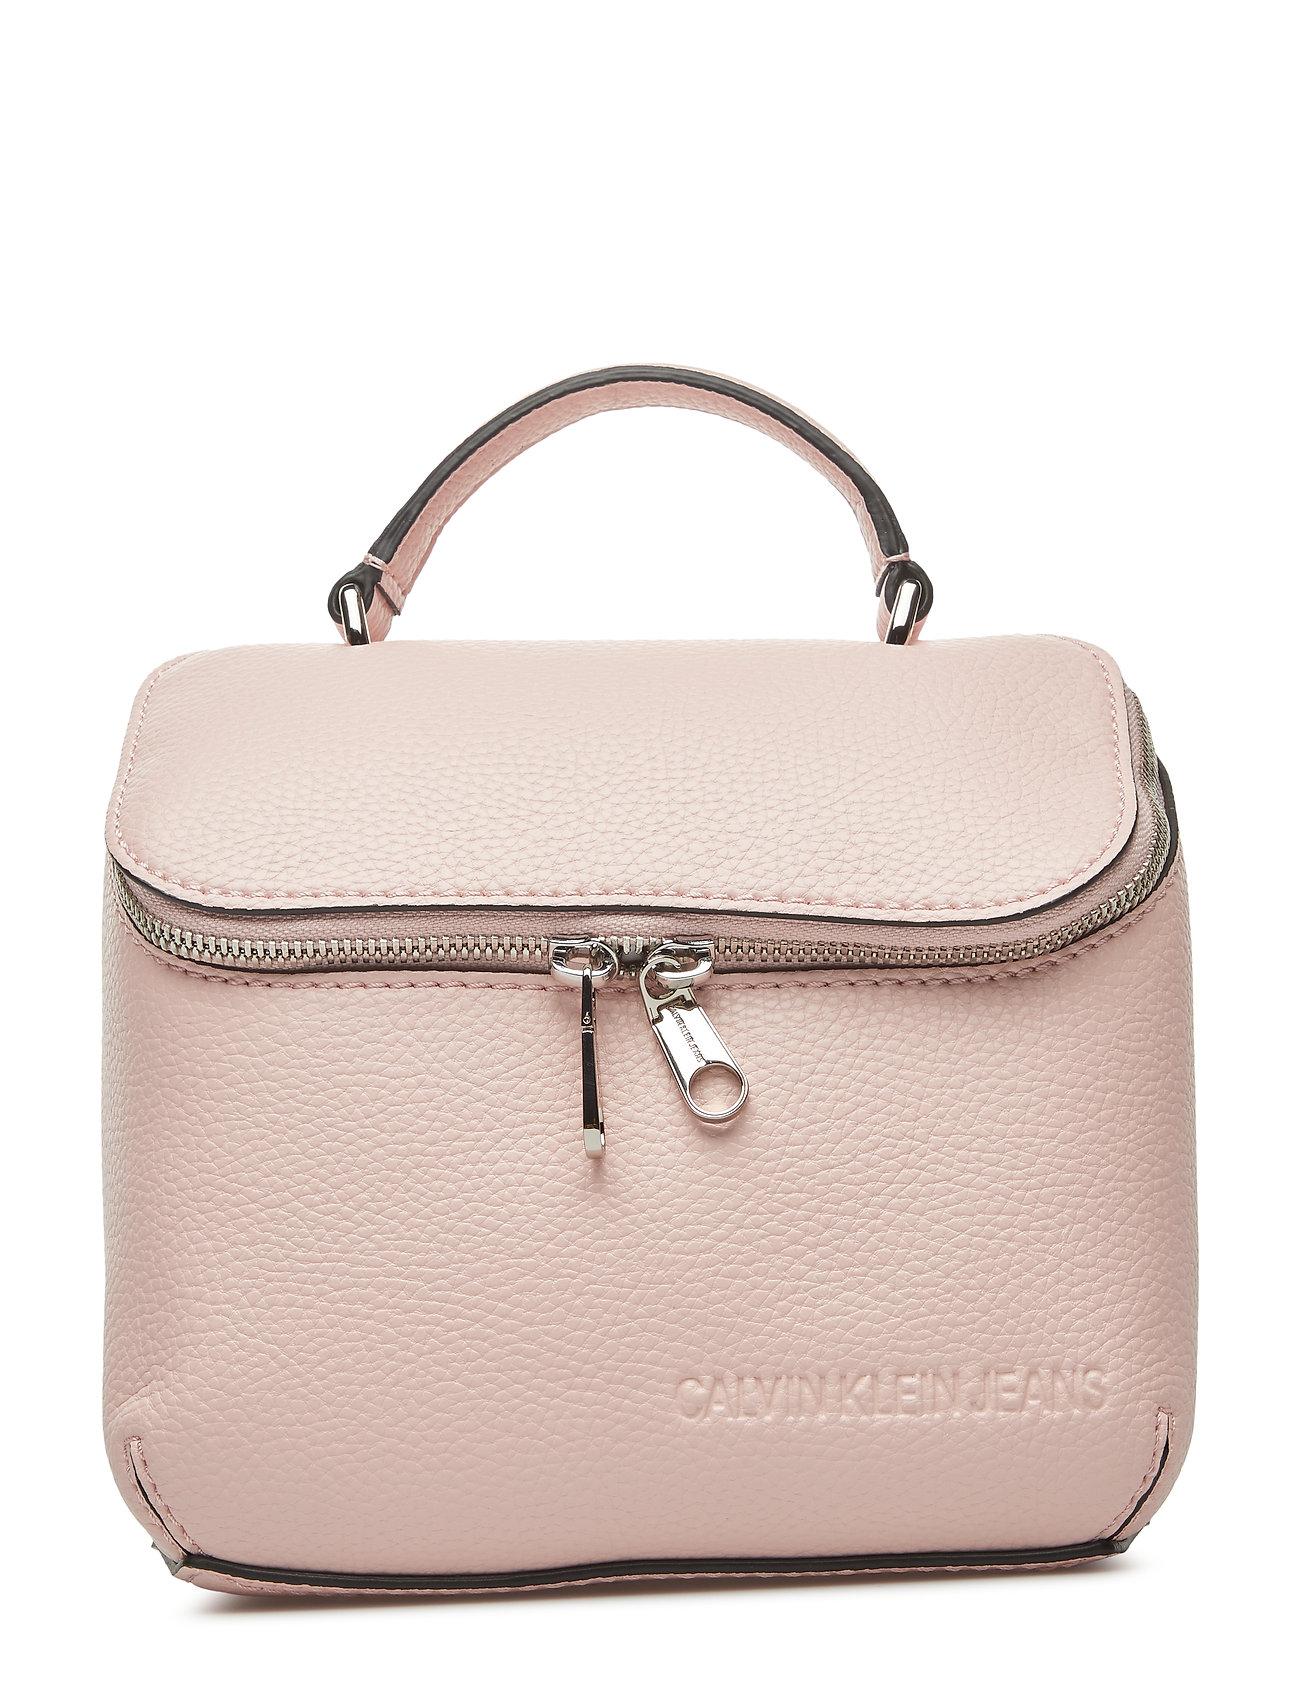 CALVIN KLEIN Ultra Light Binocular Bag Bags Small Shoulder Bags/crossbody Bags Pink CALVIN KLEIN